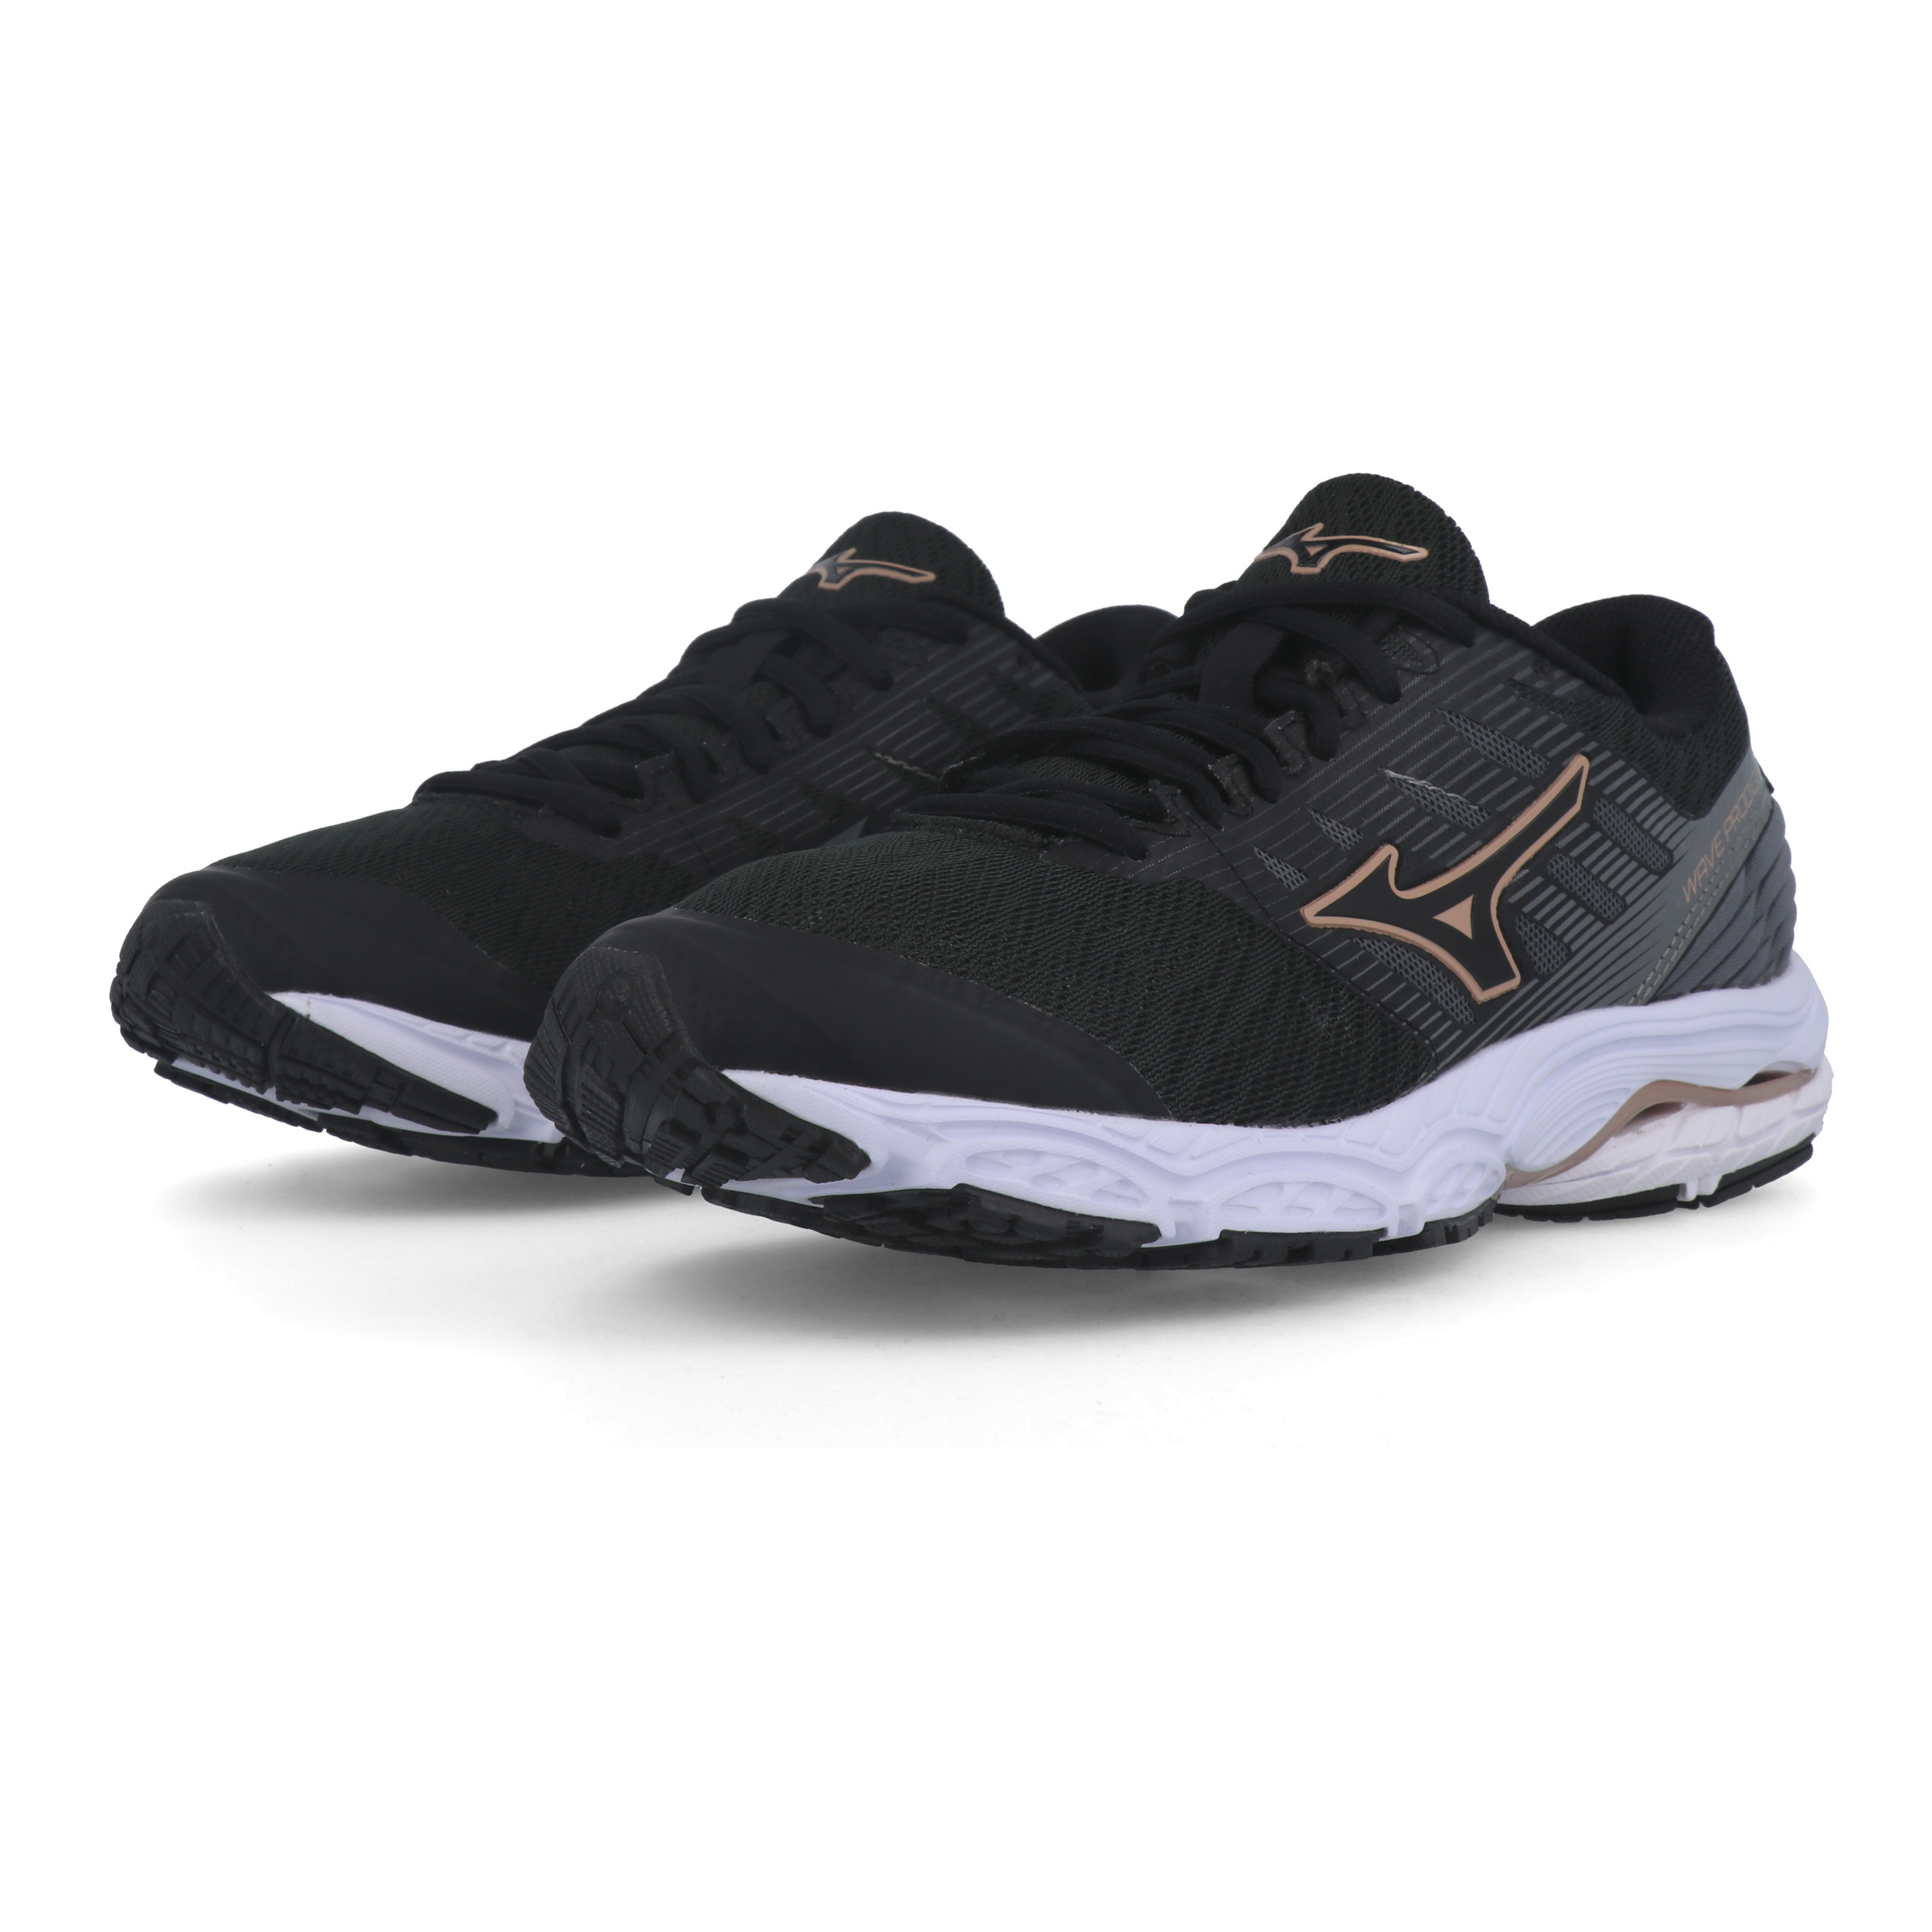 Mizuno Wave Prodigy 2 Women's Running Shoes - SS20